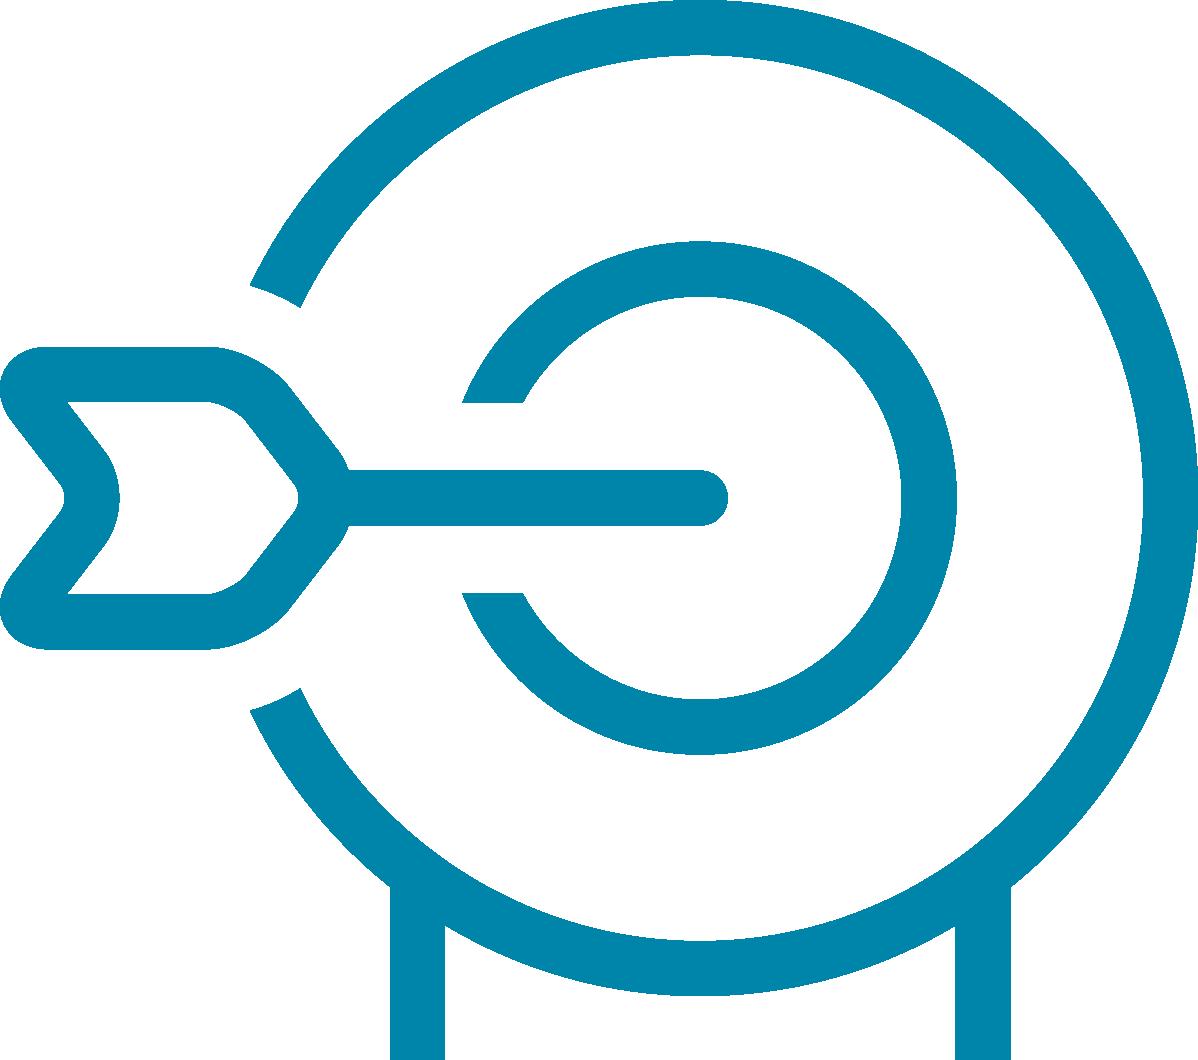 blue-target-icon